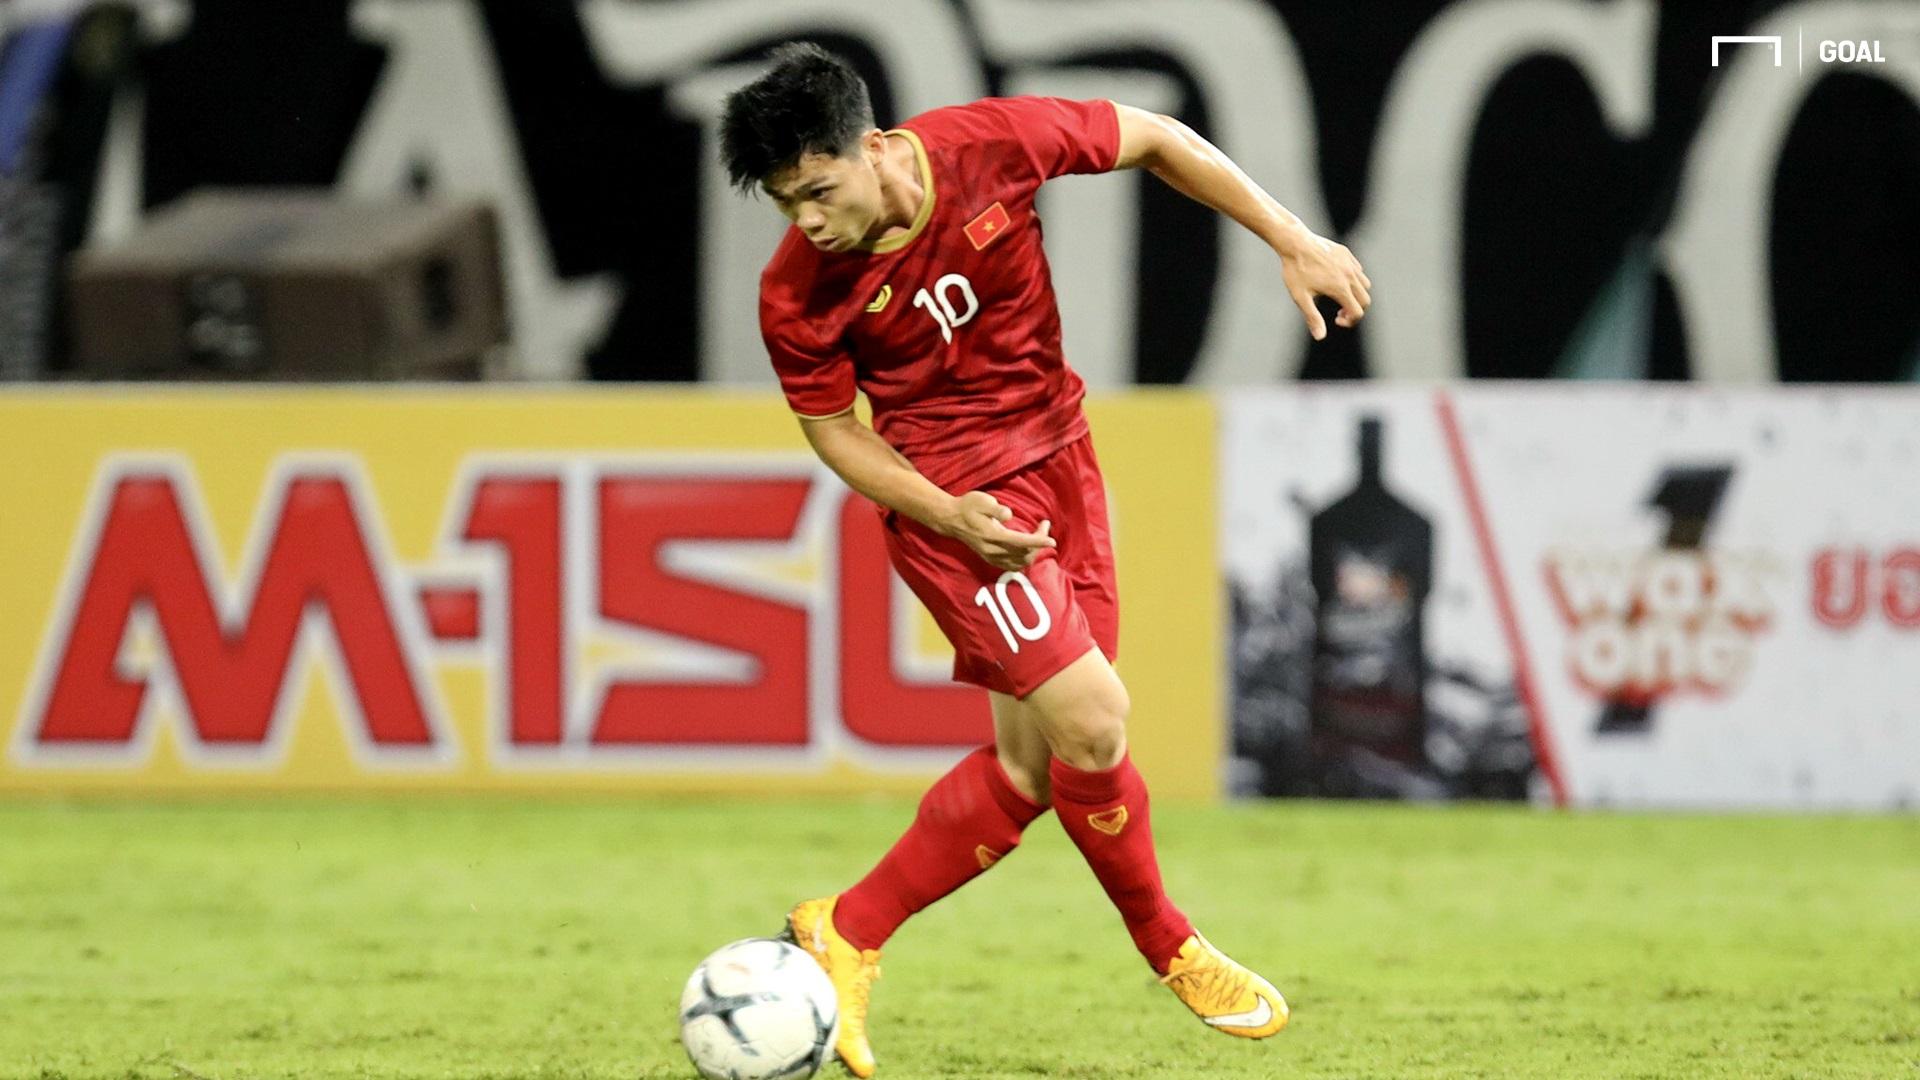 Nguyen Cong Phuong Thai Lan - Vietnam 2022 FIFA World Cup qualification